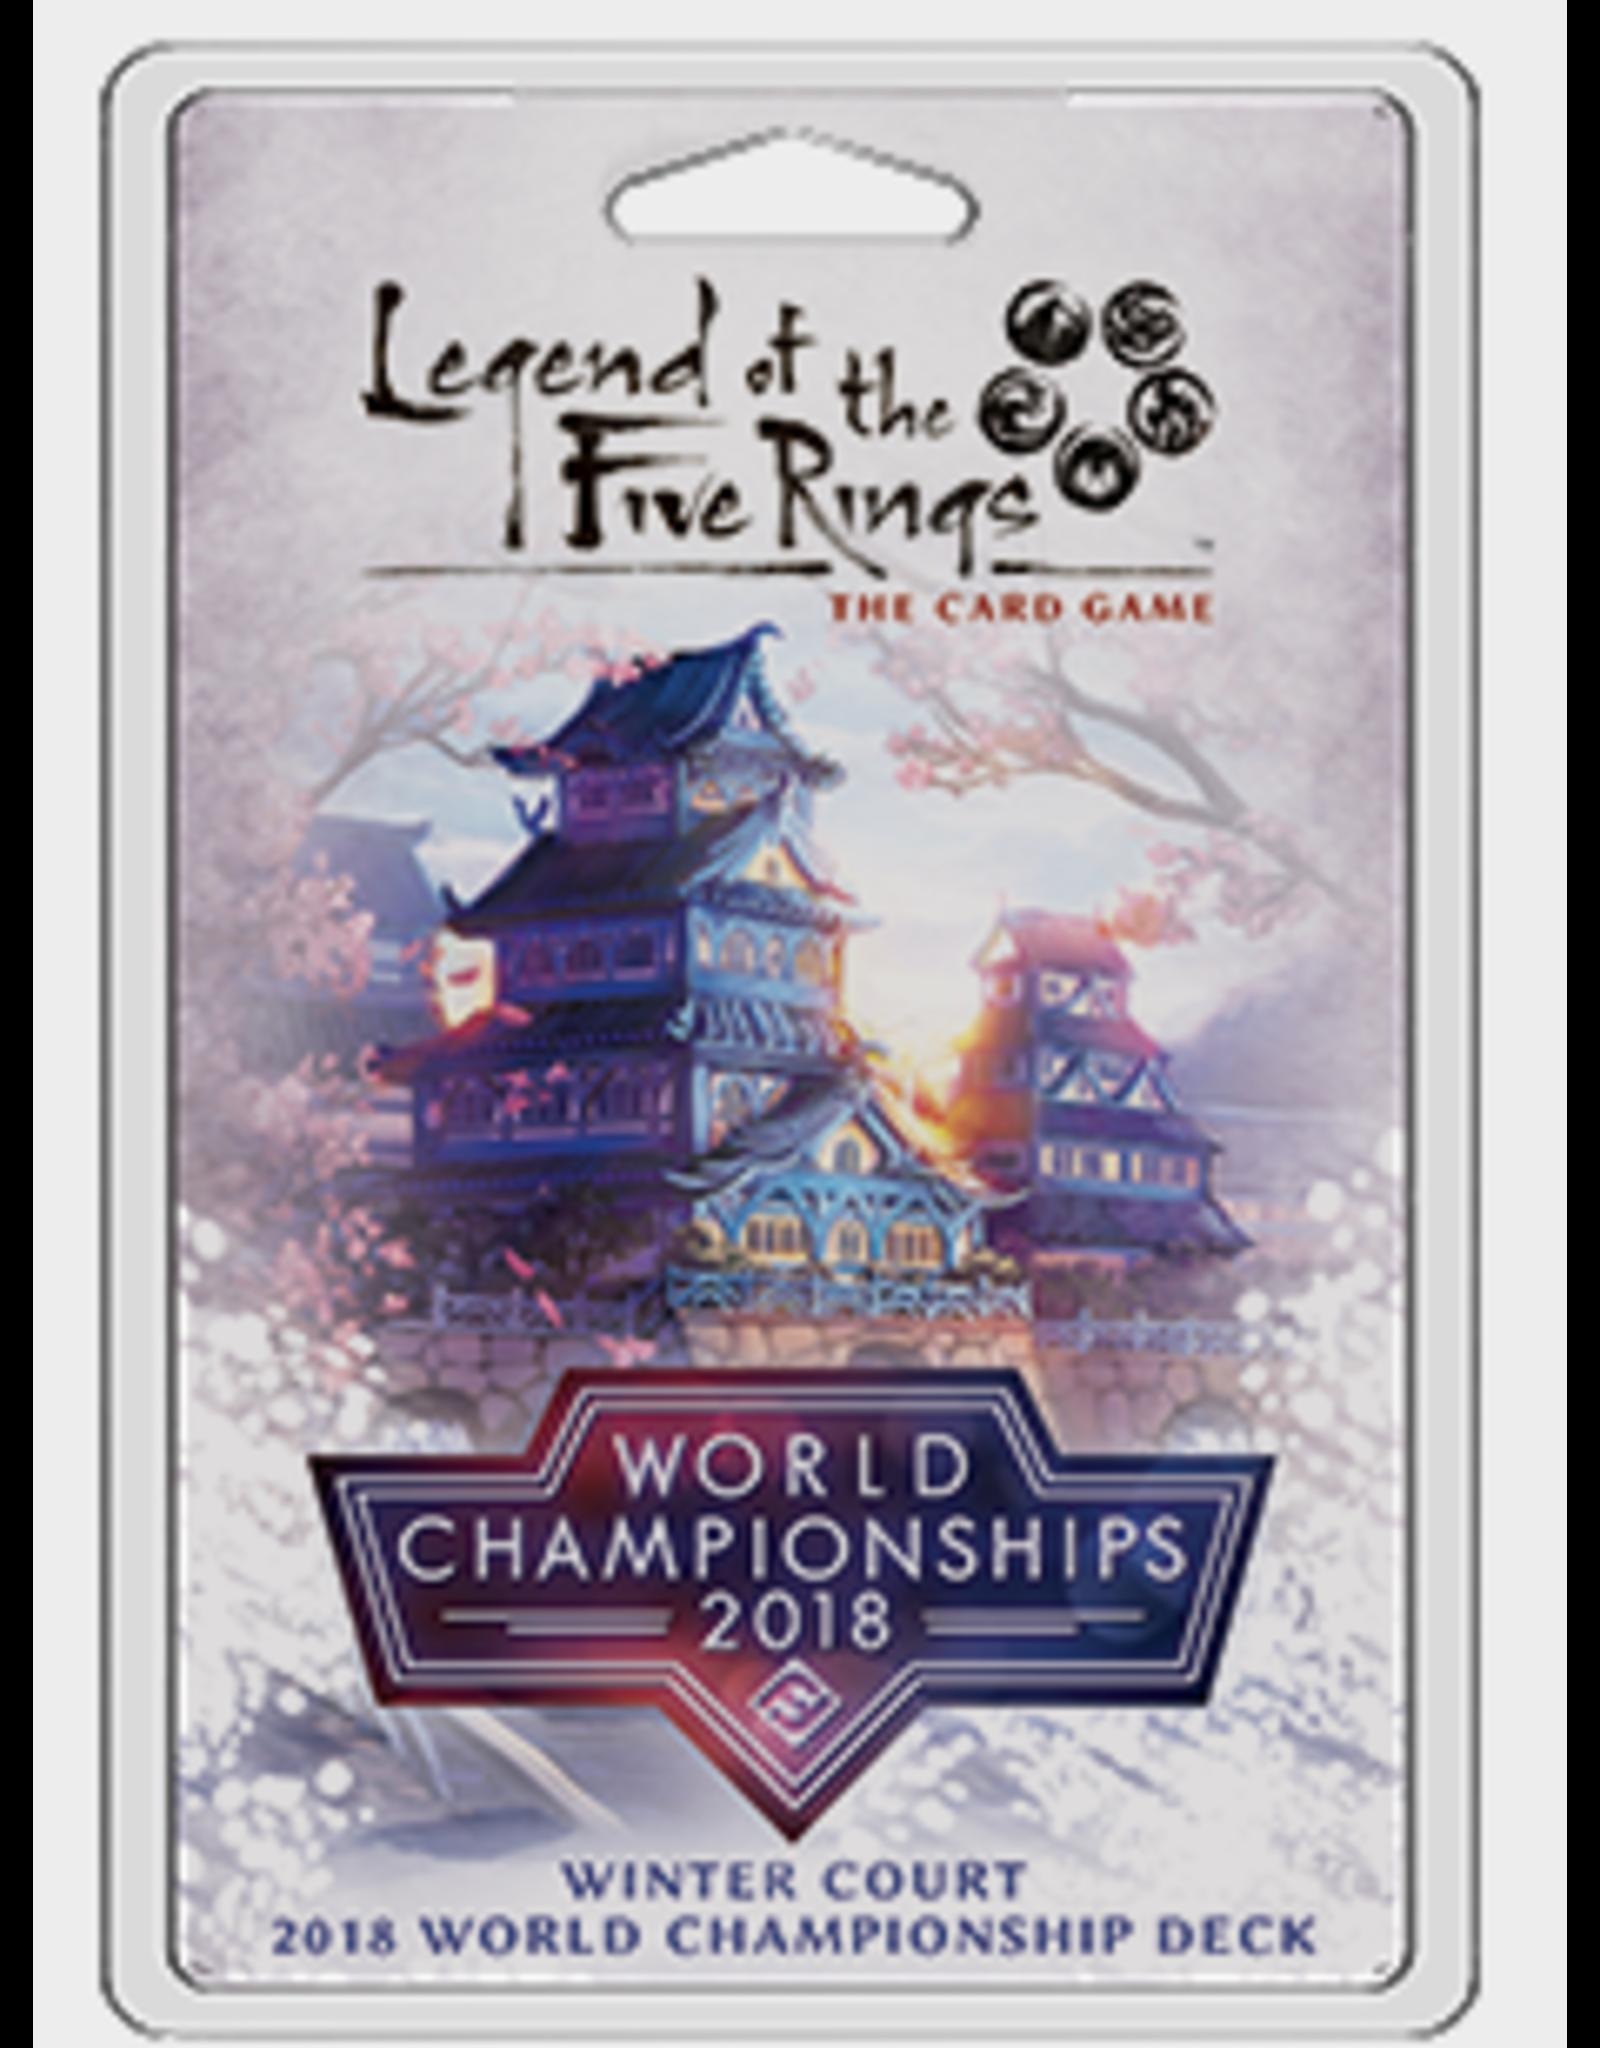 Fantasy Flight Games Legend of the Five Rings LCG: Winter Court 2018 World Championship Deck